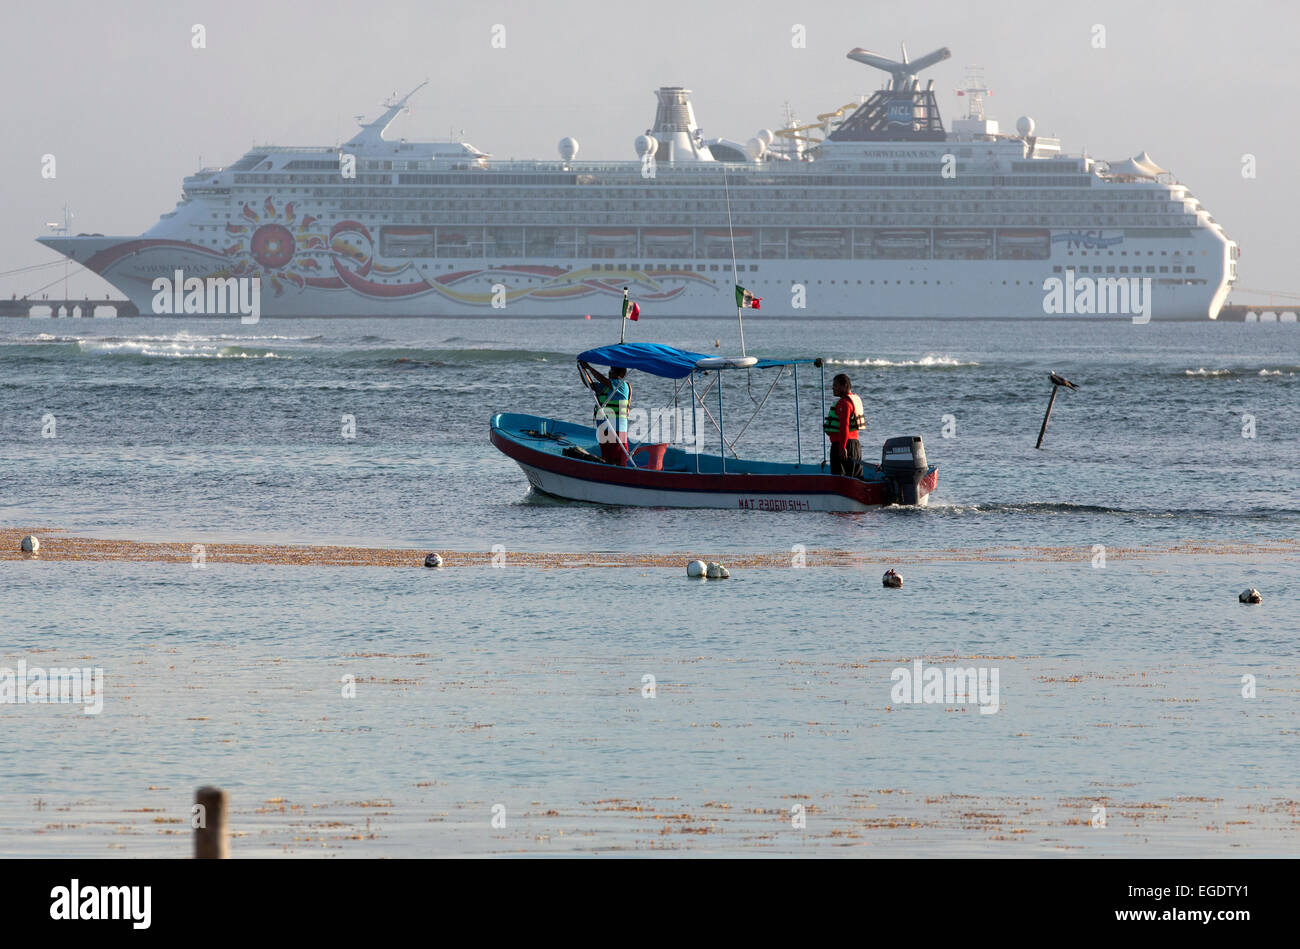 Bateau de croisière en bateau de pêche local Mahahual Quinitana retraités retraités Roo Ocean Photo Stock